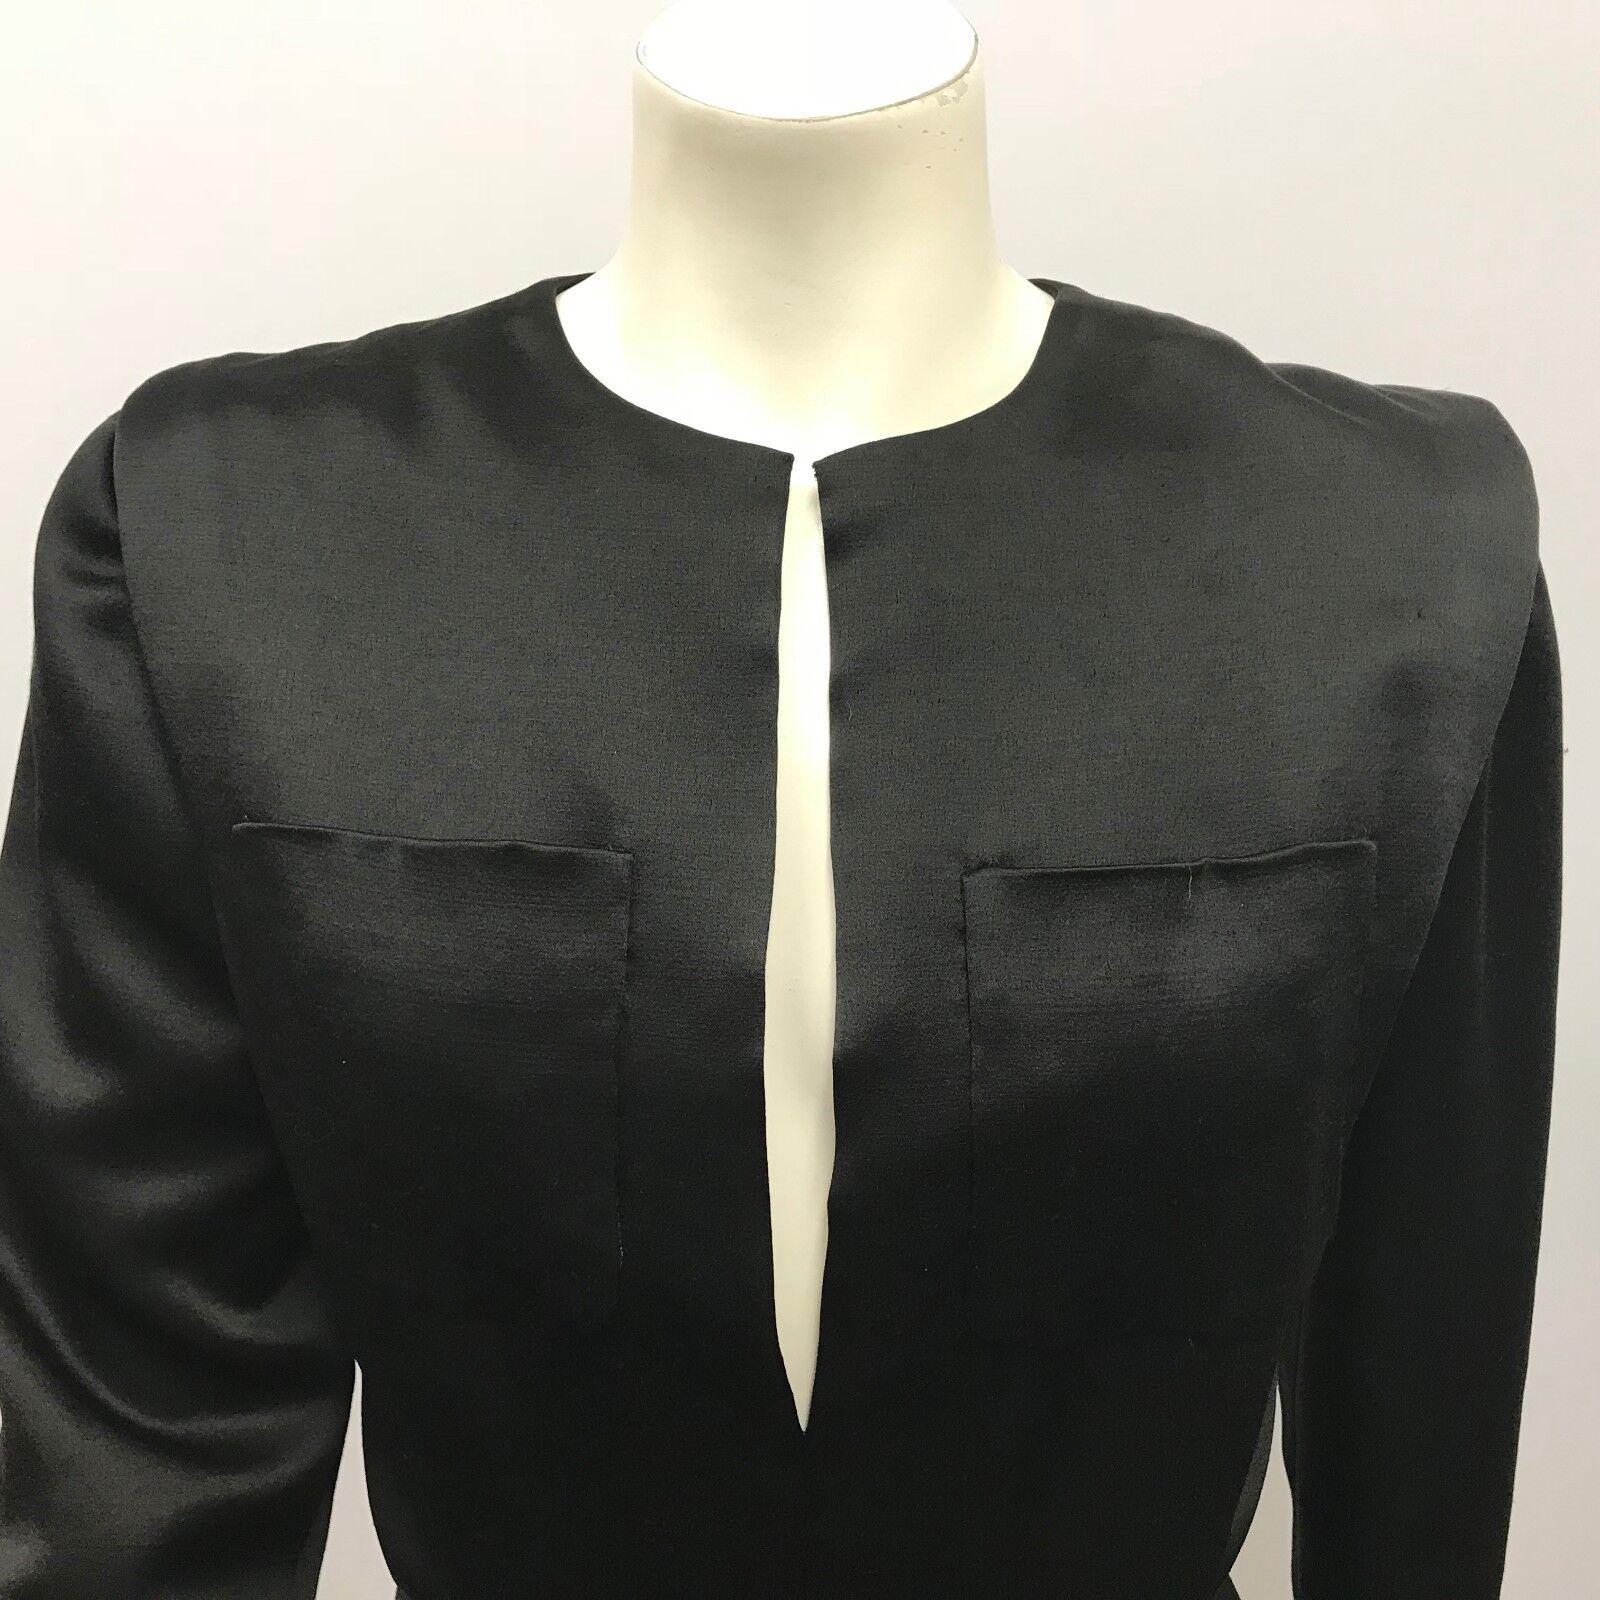 VINTAGE SCAASI BOUTIQUE DRESS COCKTAIL DRESS BLAC… - image 6